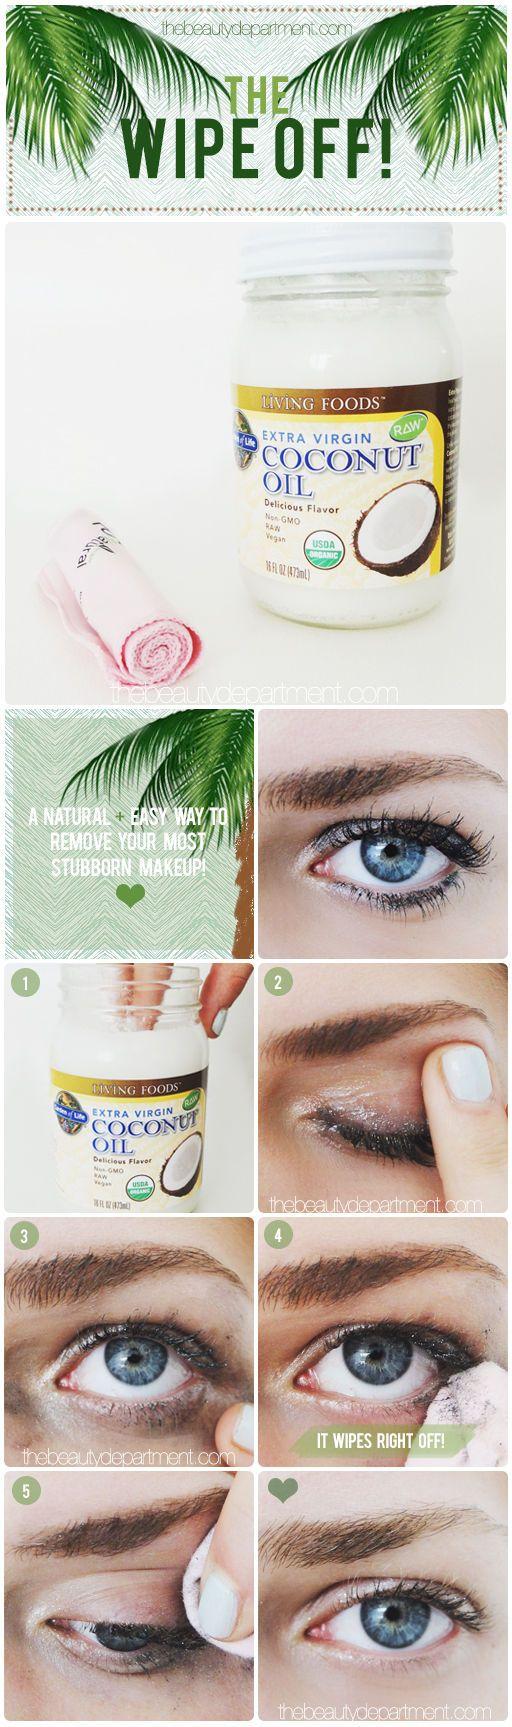 25 Breathtaking yet Super-Quick Morning Beauty Hacks for Lazy Girls